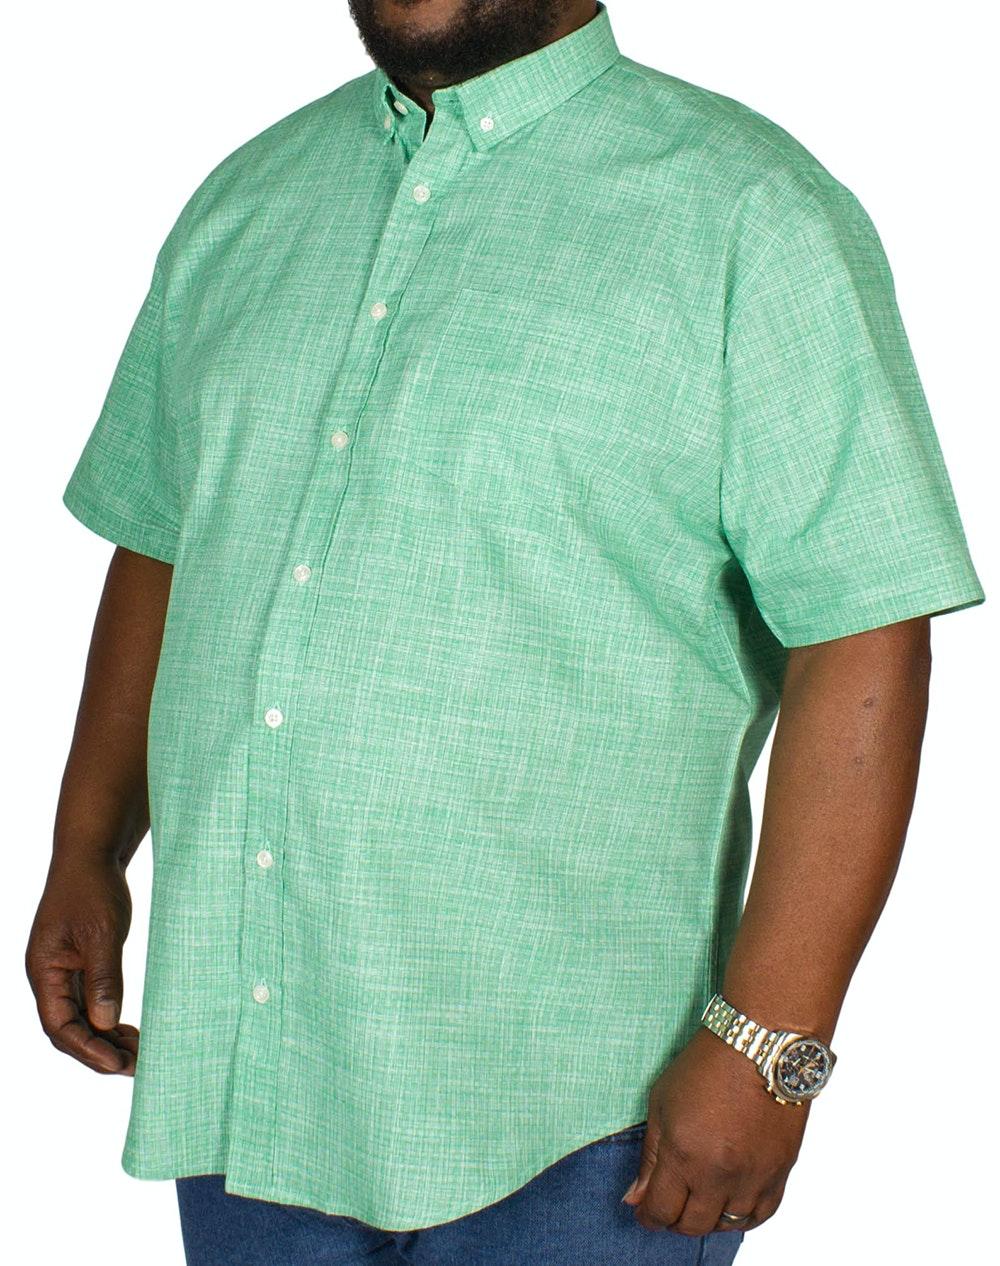 Bigdude Woven Pattern Shirt Green